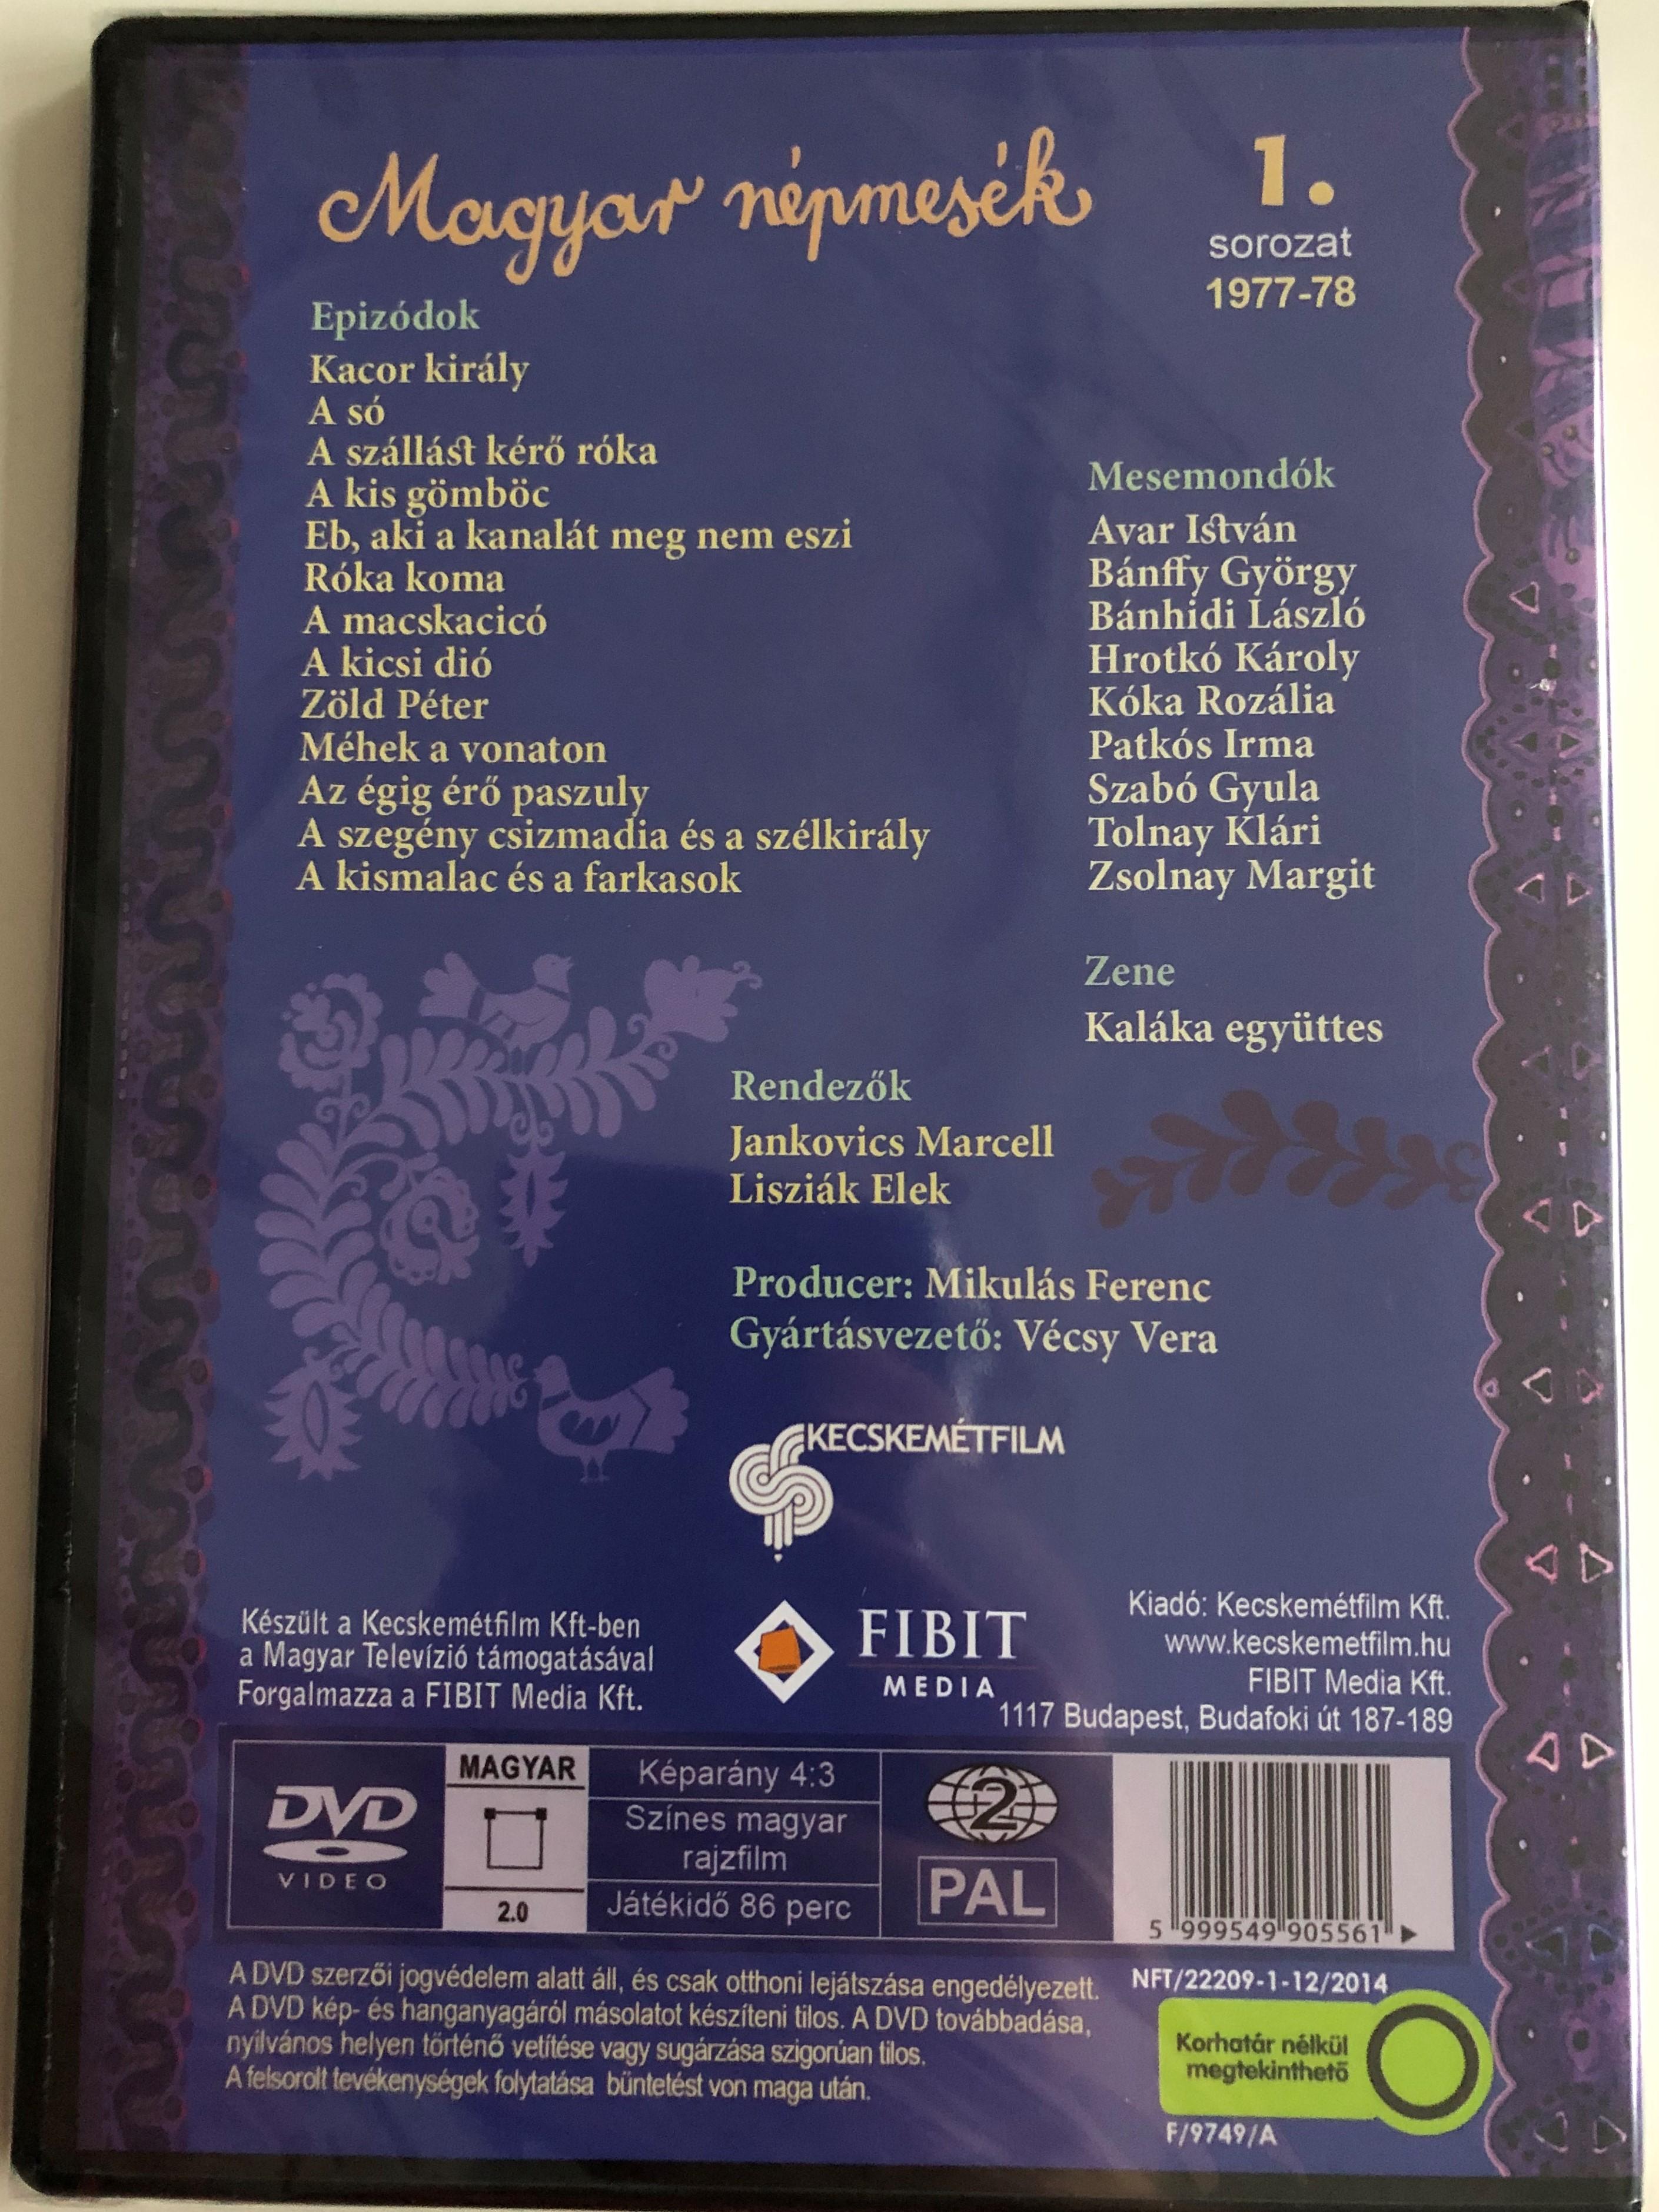 magyar-n-pmes-k-1.-kacor-kir-ly-dvd-1977-1978-audio-hungarian-13-episodes-on-disc-2-.jpg